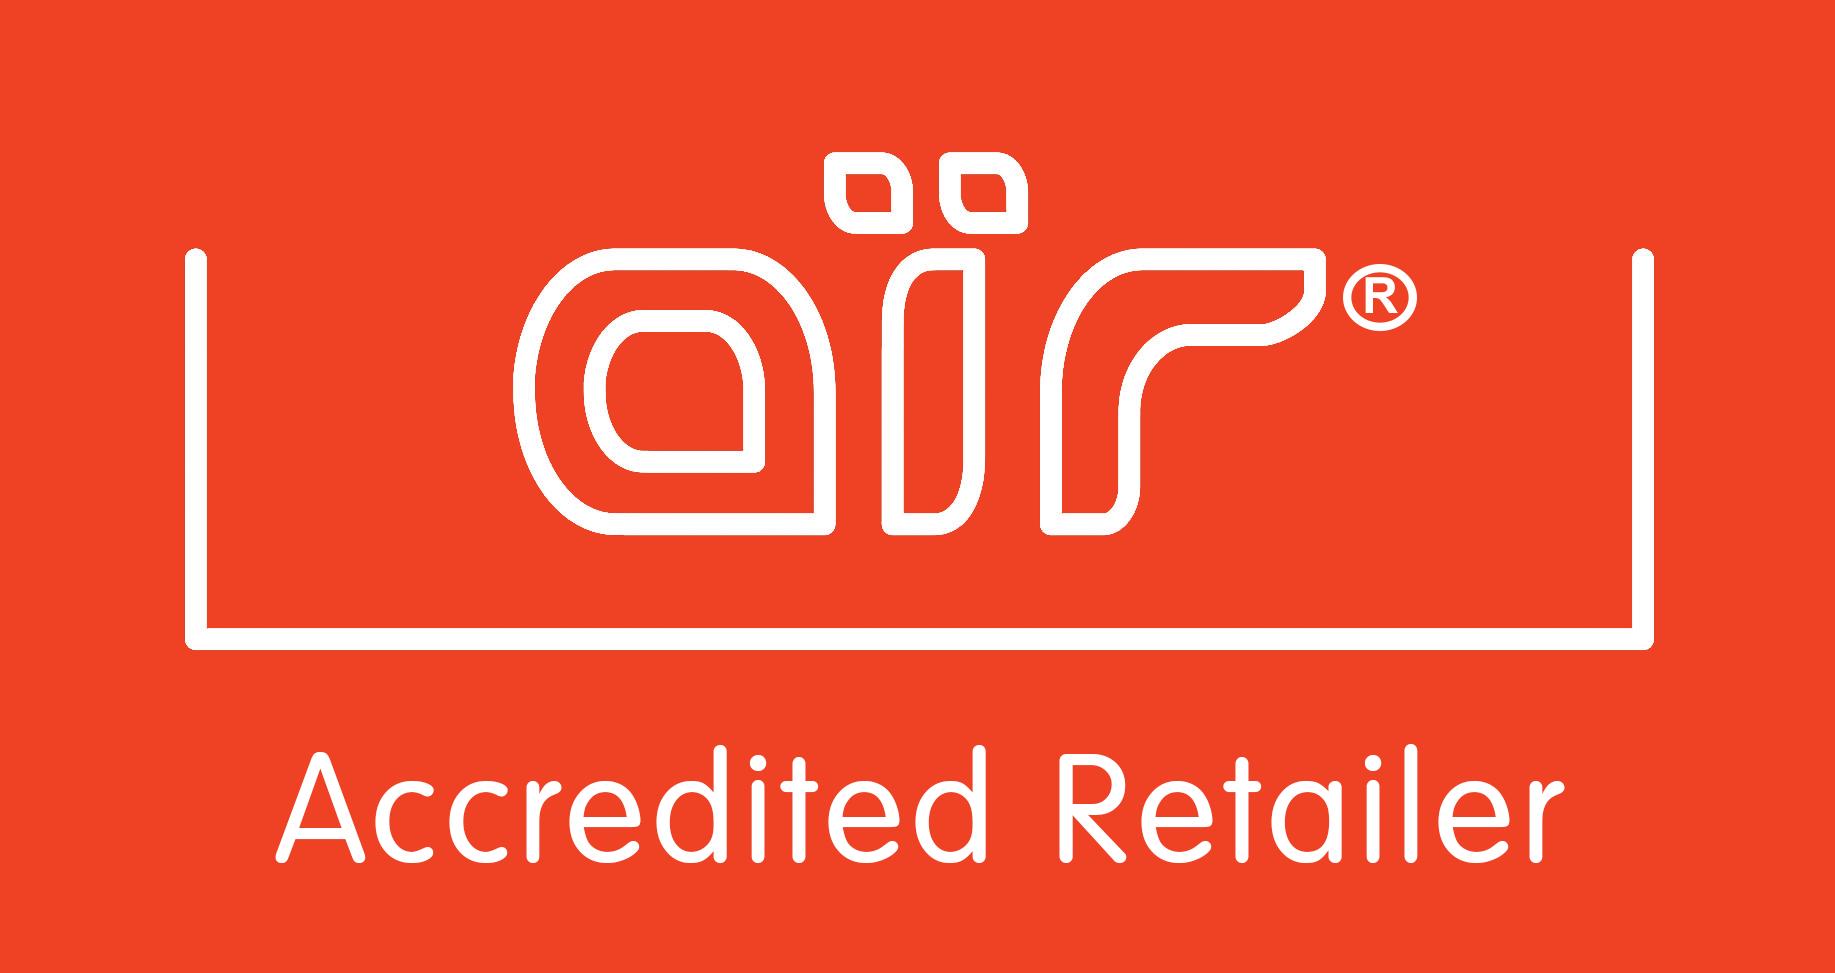 air Accredited Retailer logo